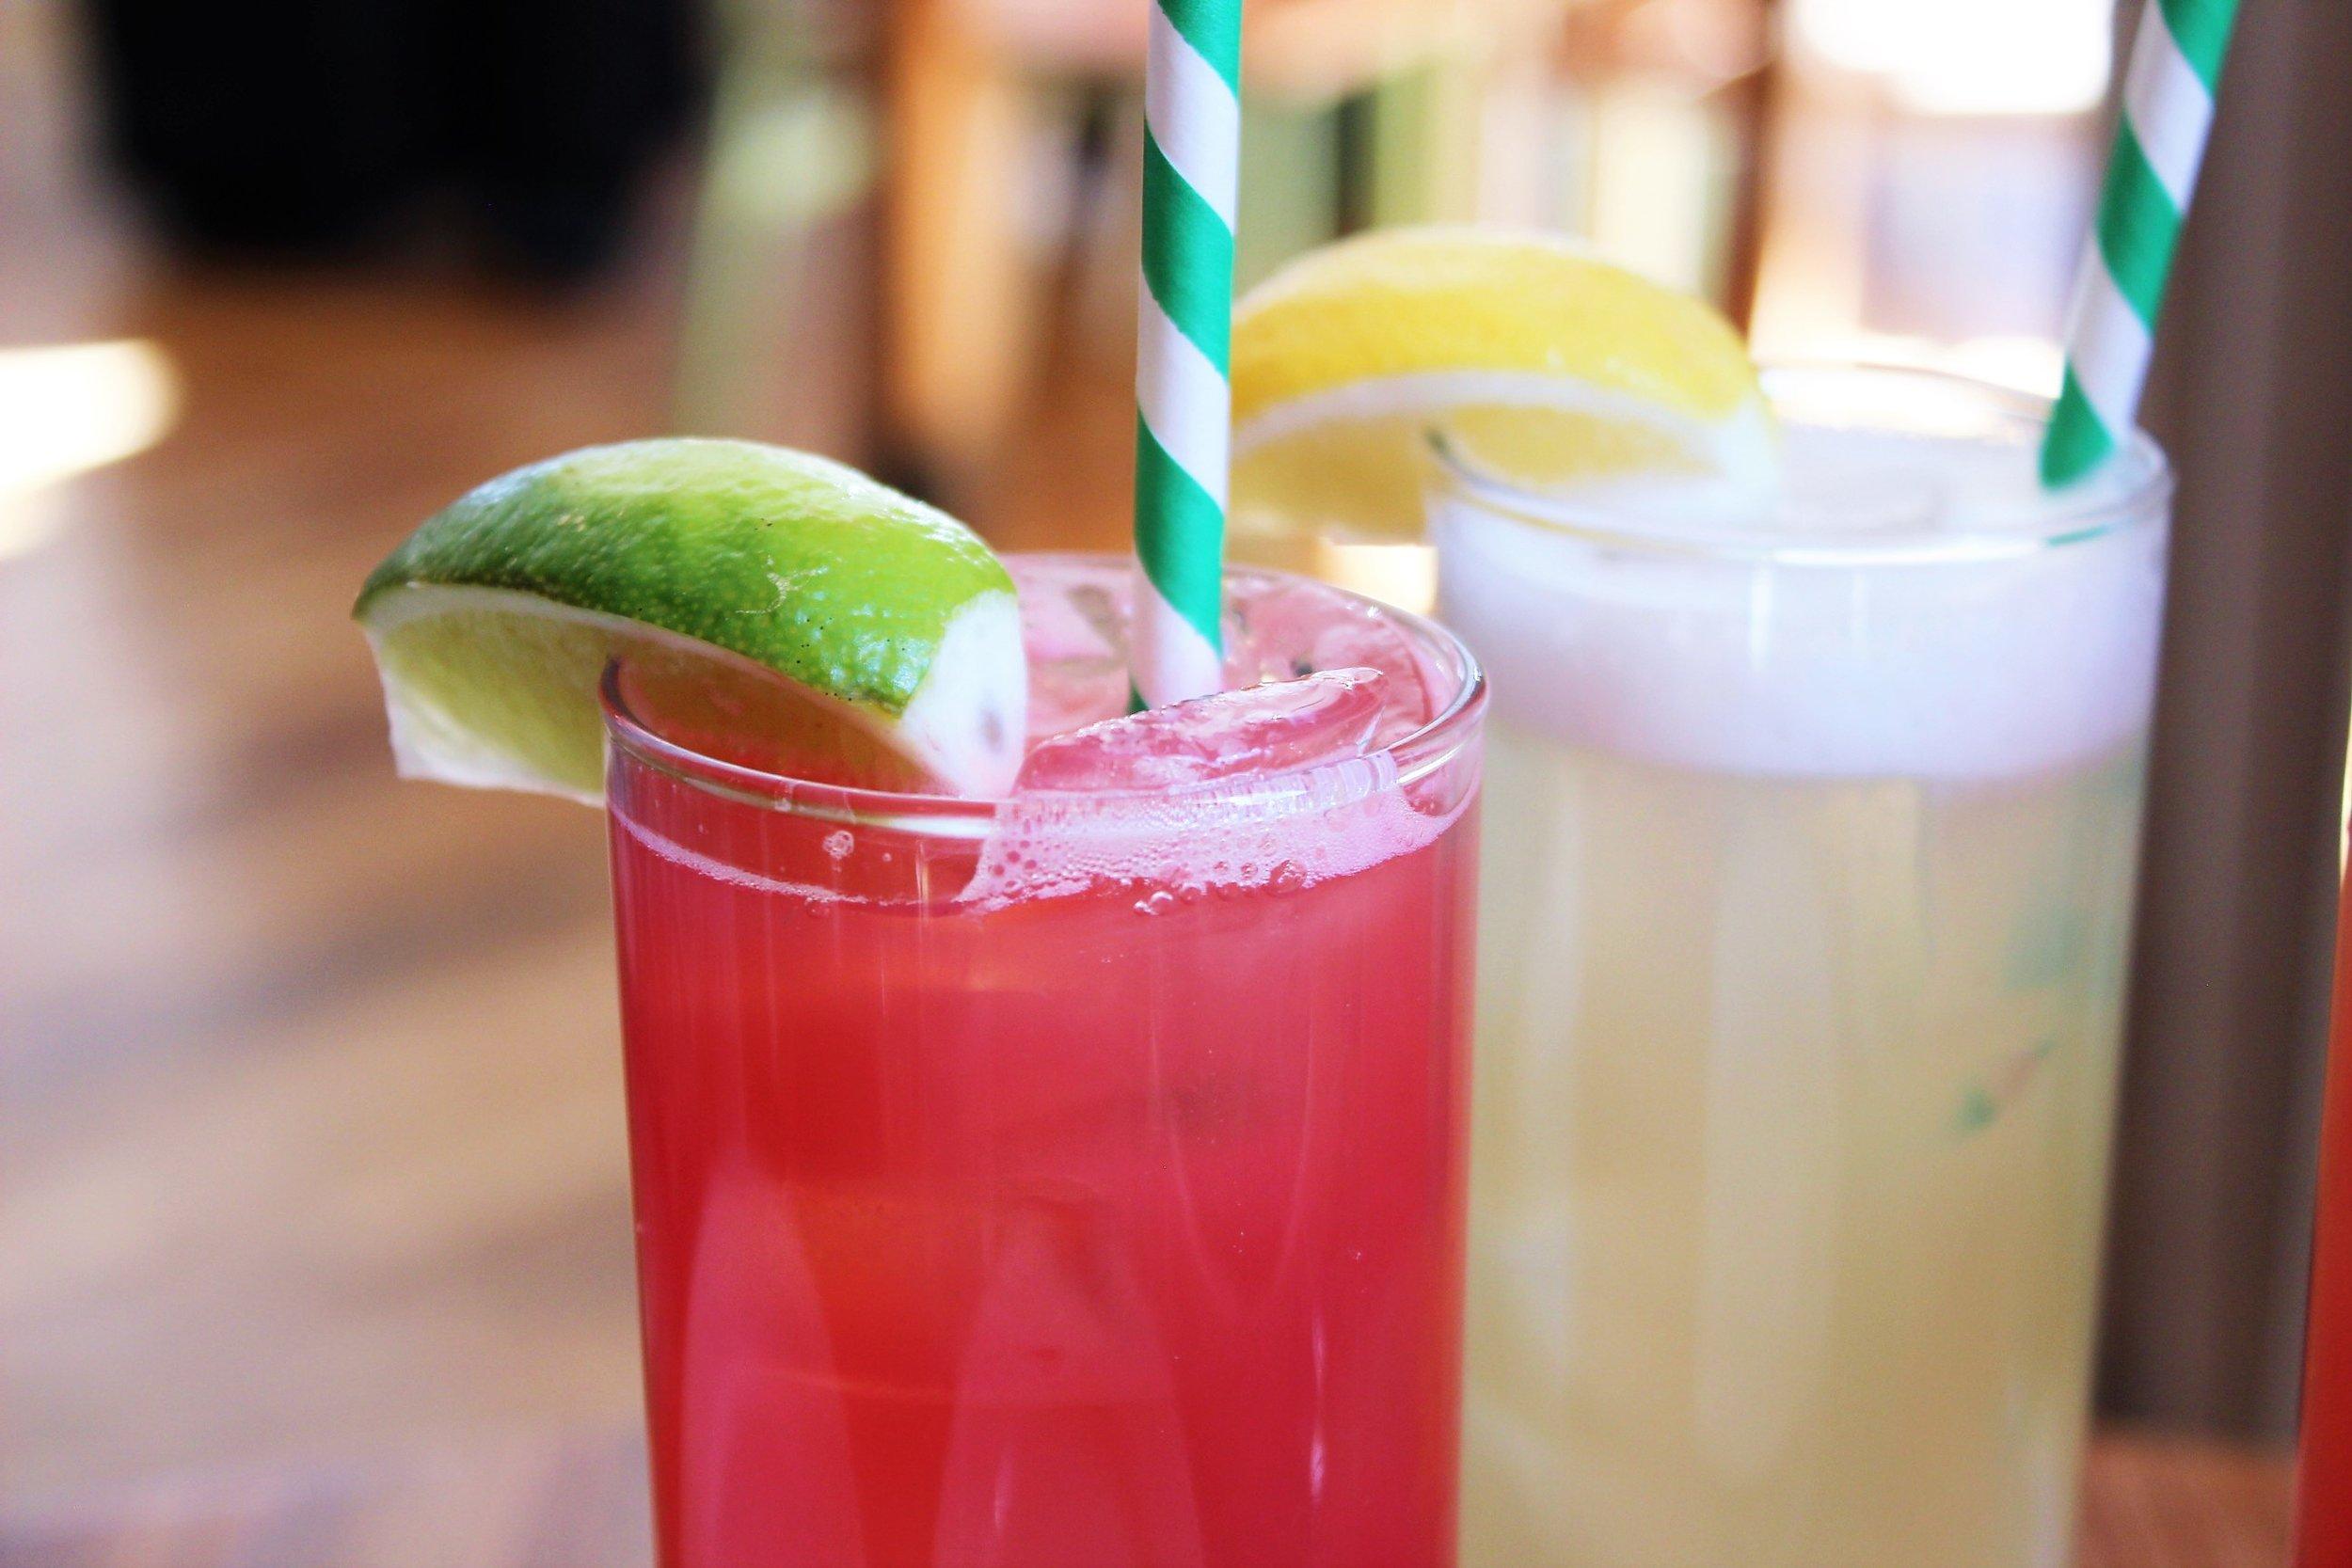 Watermelon Juice and Lemonade at Seamore's